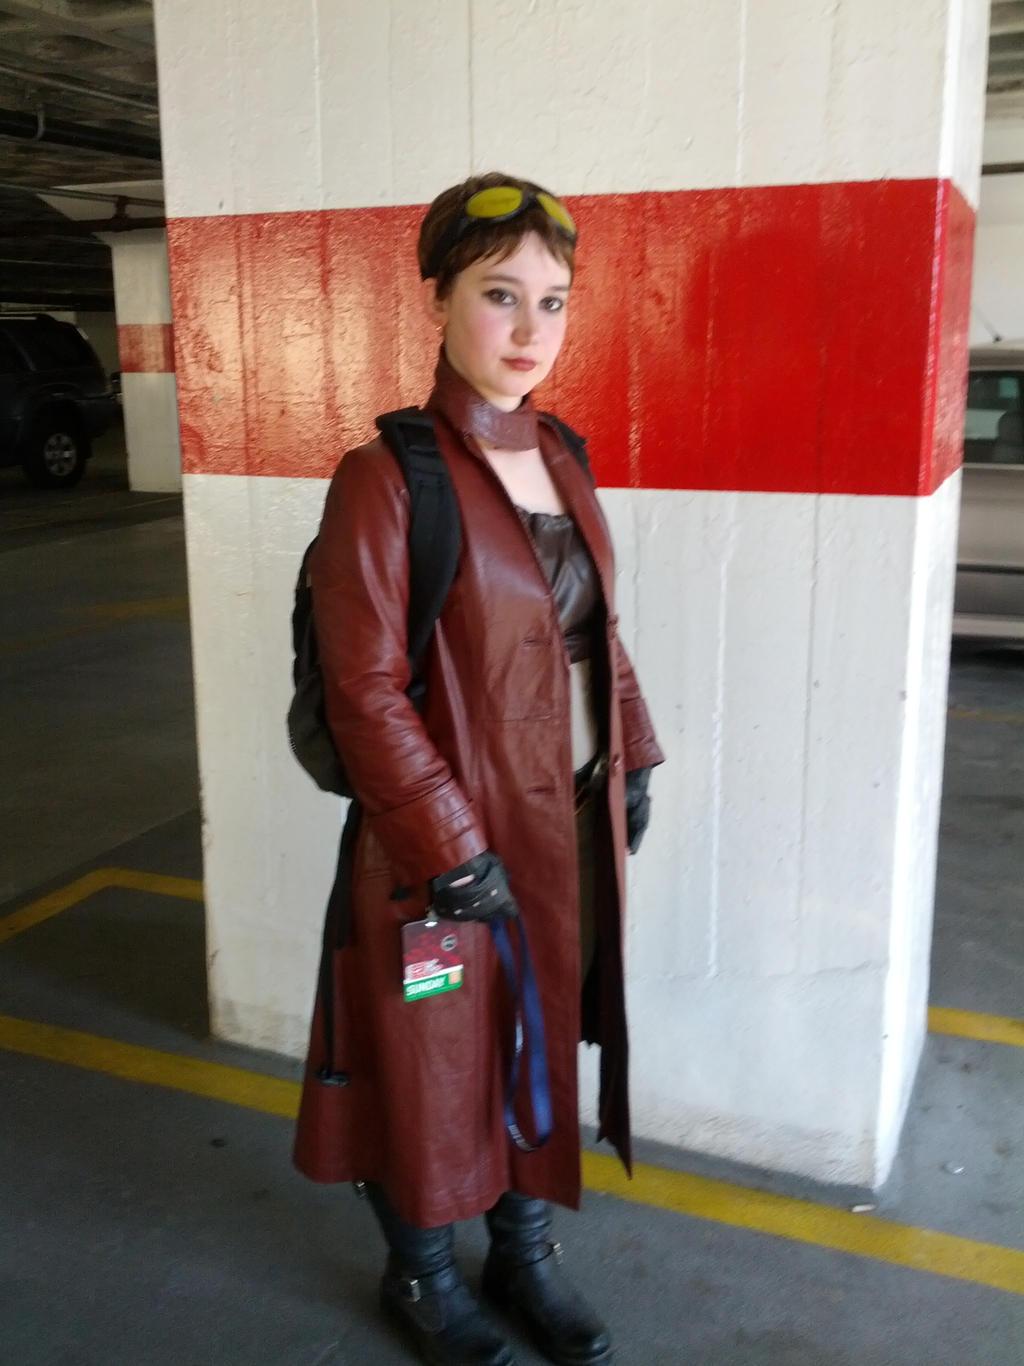 Borderlands 2 Patricia Tannis Cosplay By Suicidalpete On Deviantart